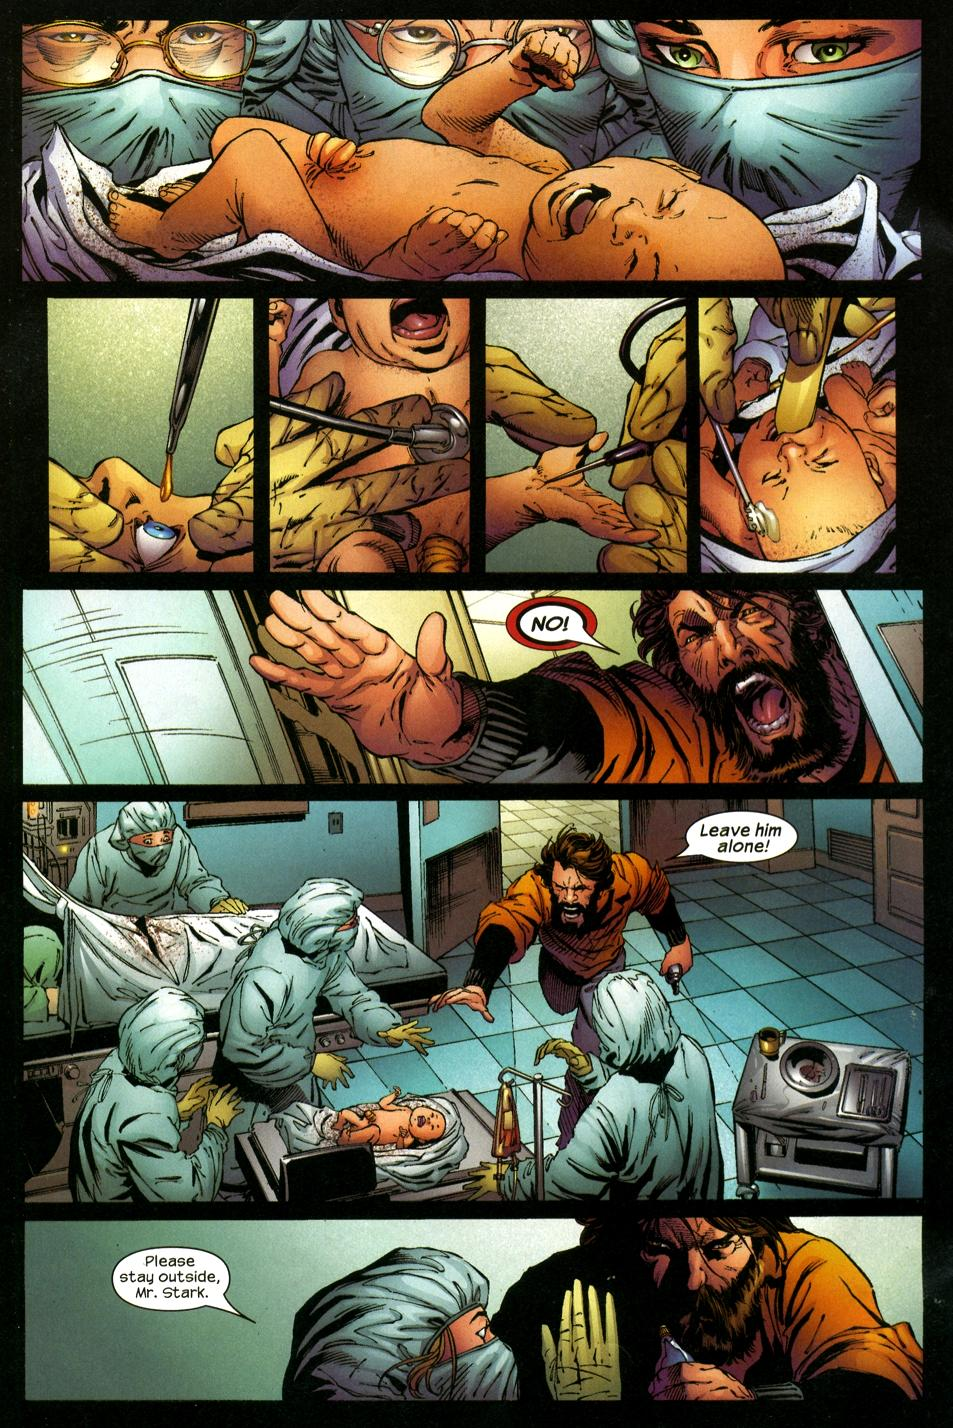 birth of iron man003 | Mars Will Send No More